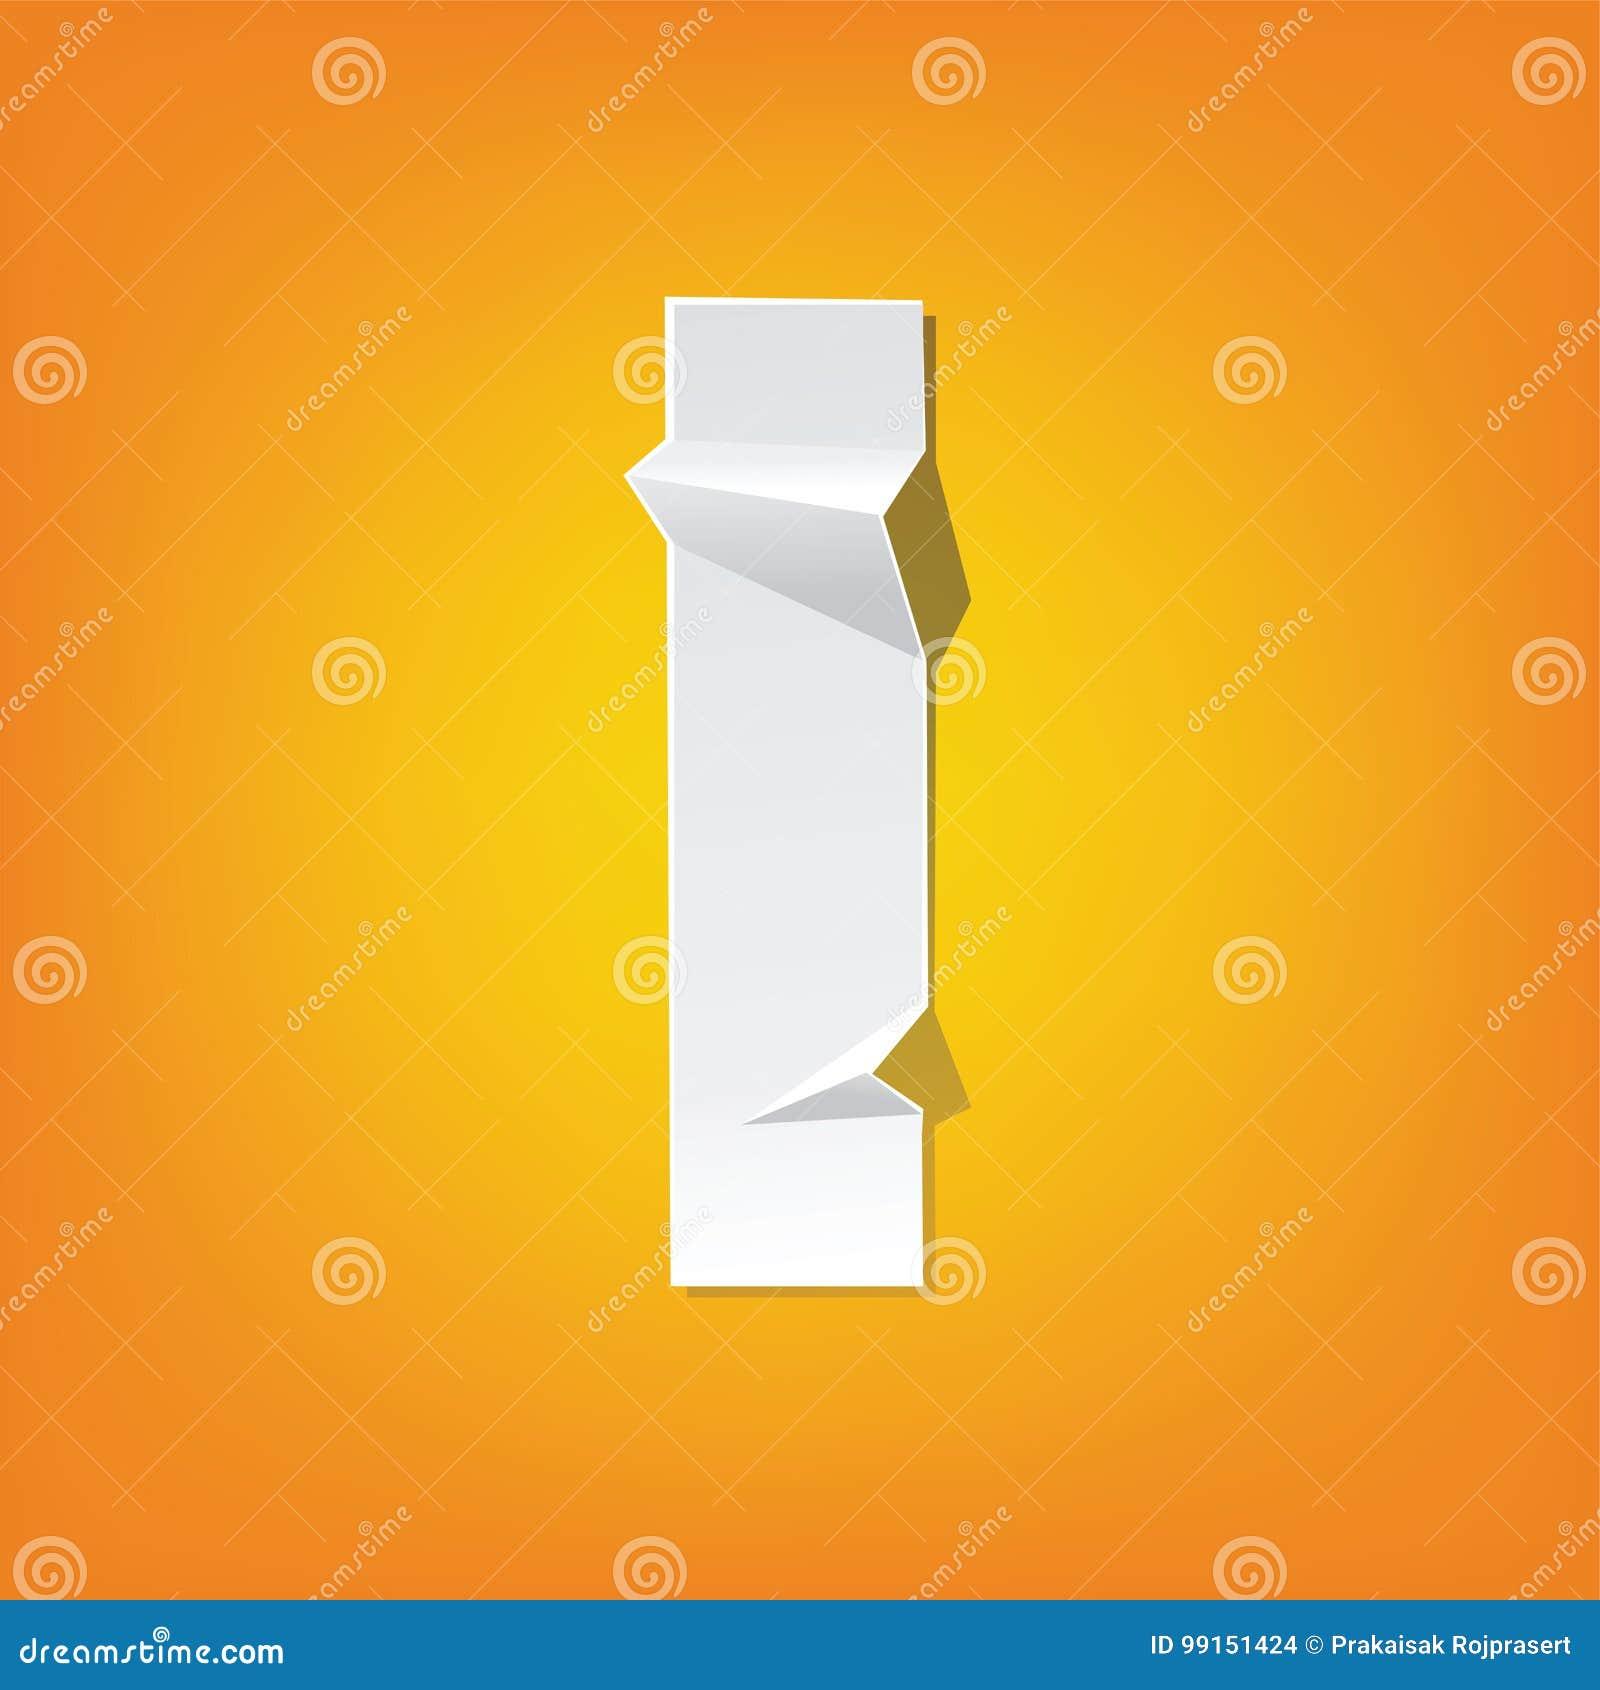 L Lowercase Letter Fold English Alphabet New Design Stock